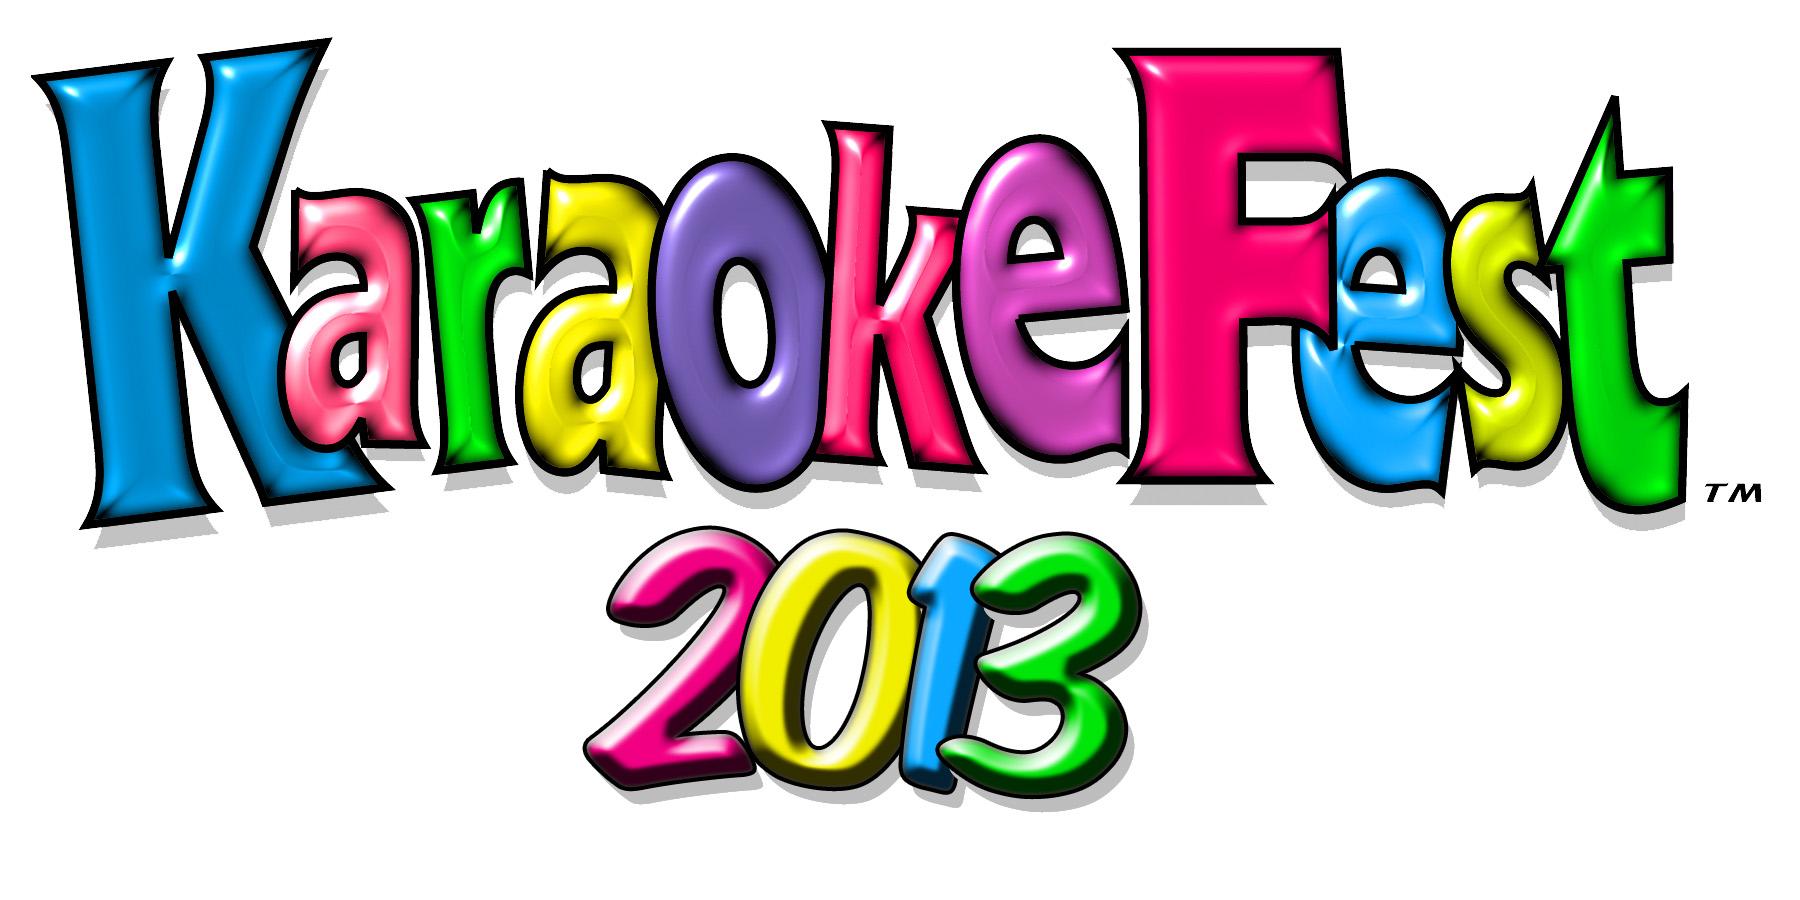 karaokefest-logo-trademark